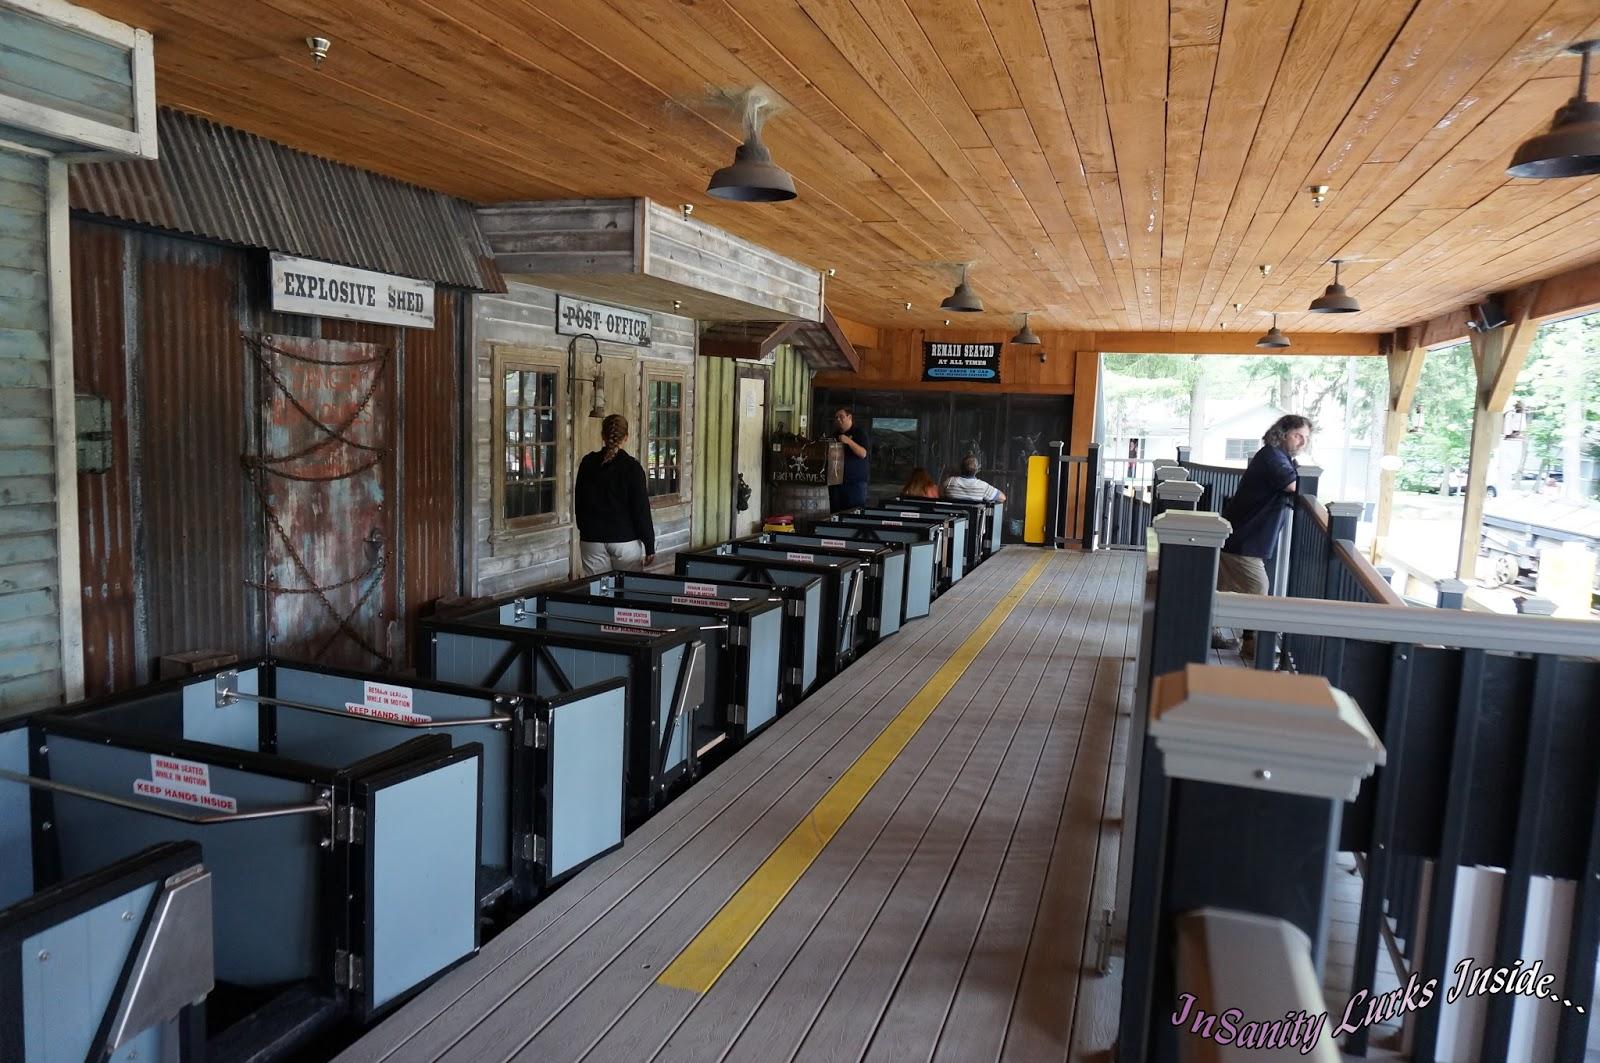 InSanity lurks Inside: Park Review- Knoebels Amusement Resort